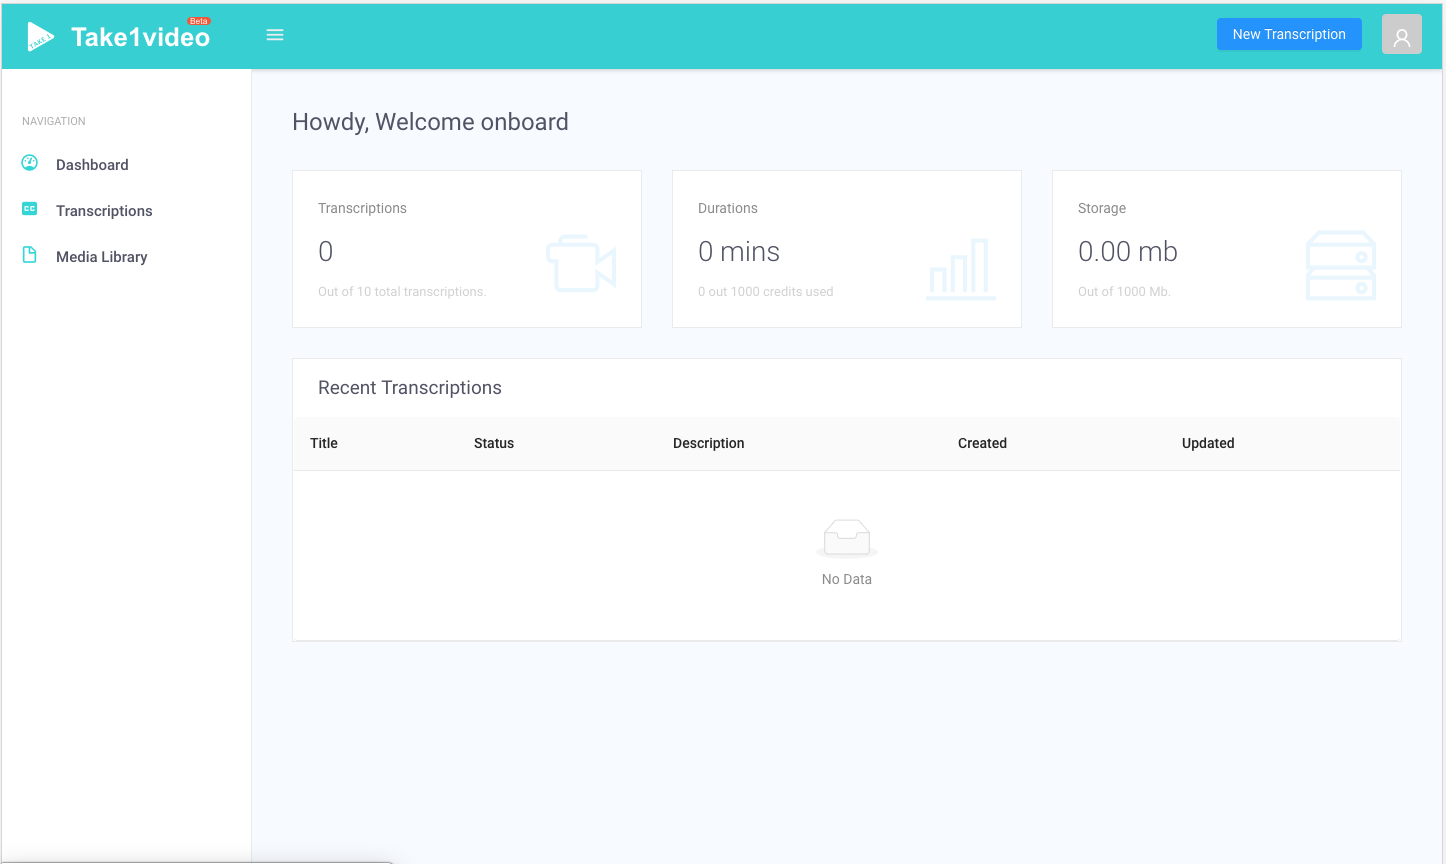 screenshot of take 1 video user interface of the dashboard